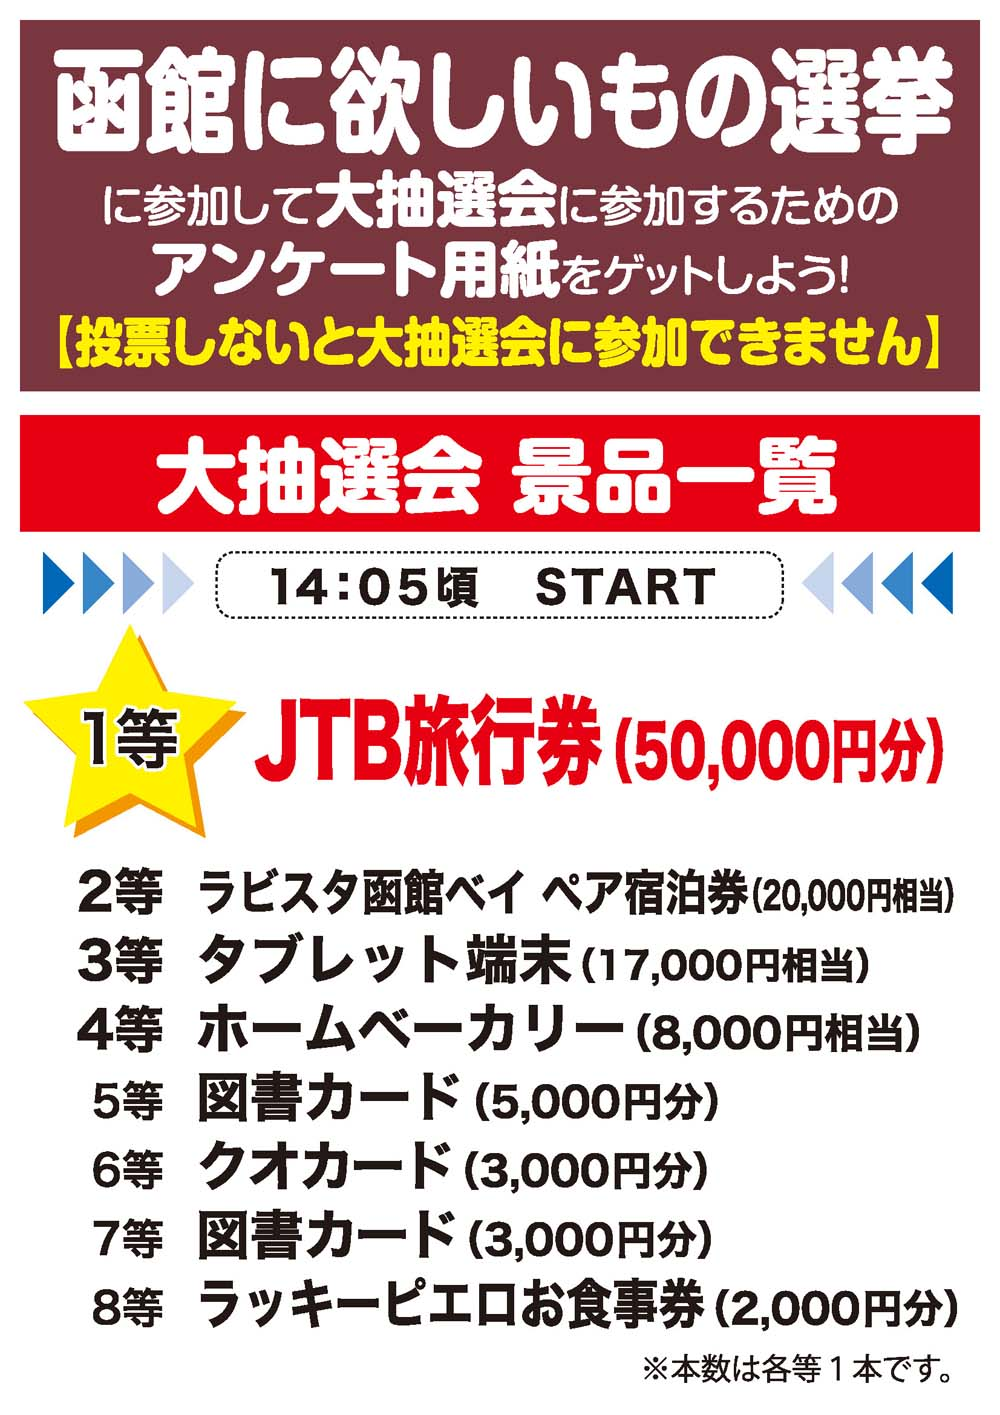 http://www.hakodate20.com/image/66th_cyusen.jpg